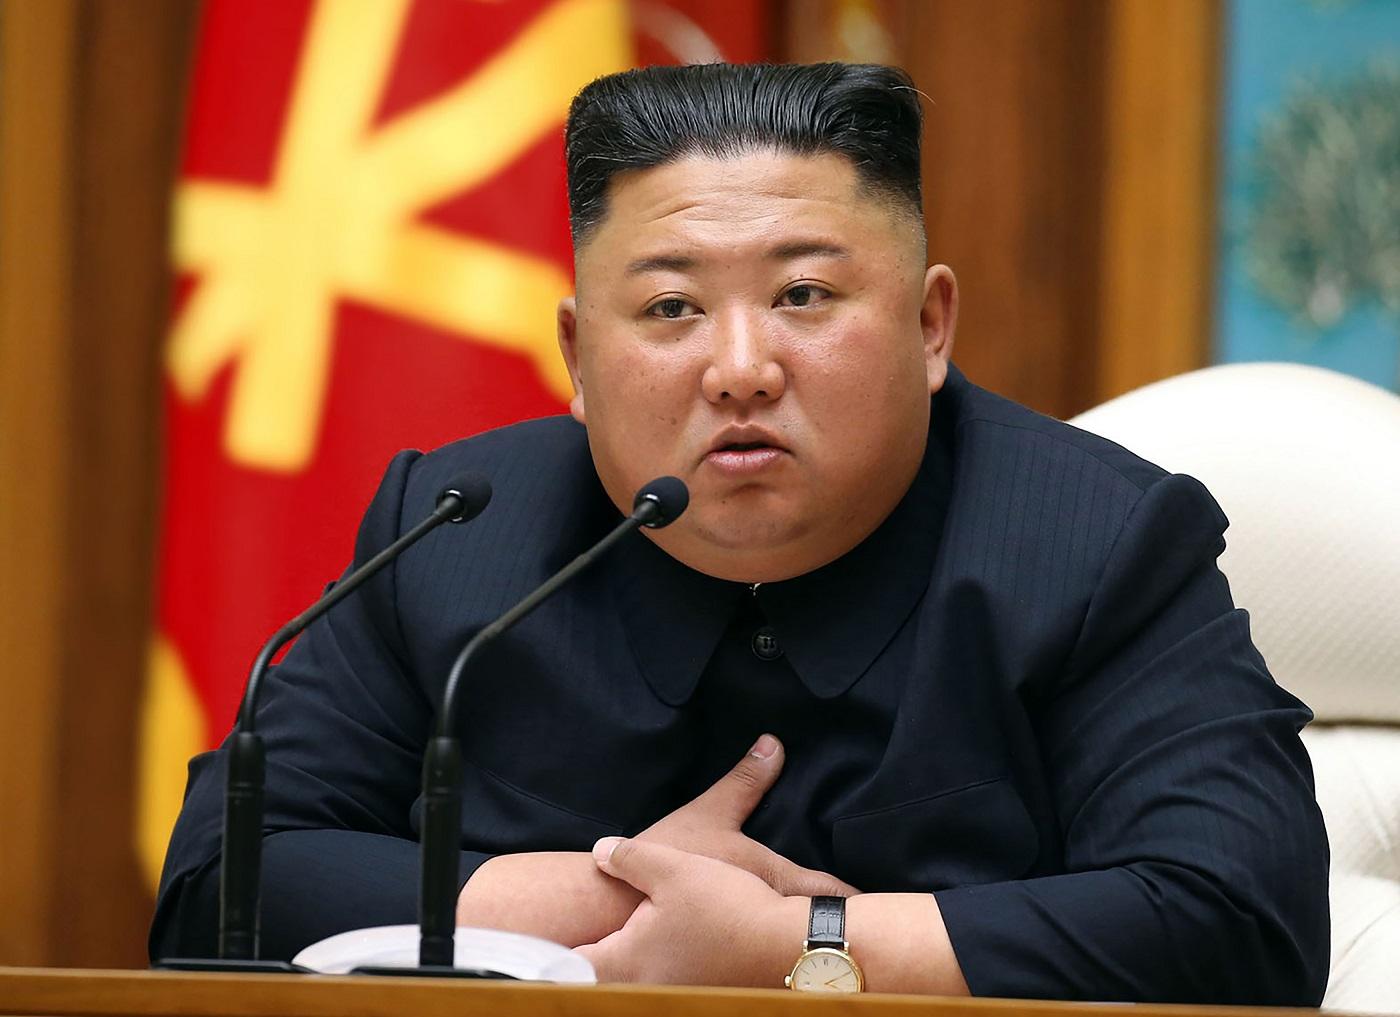 (Foto: STR / KCNA VIA KNS / AFP)